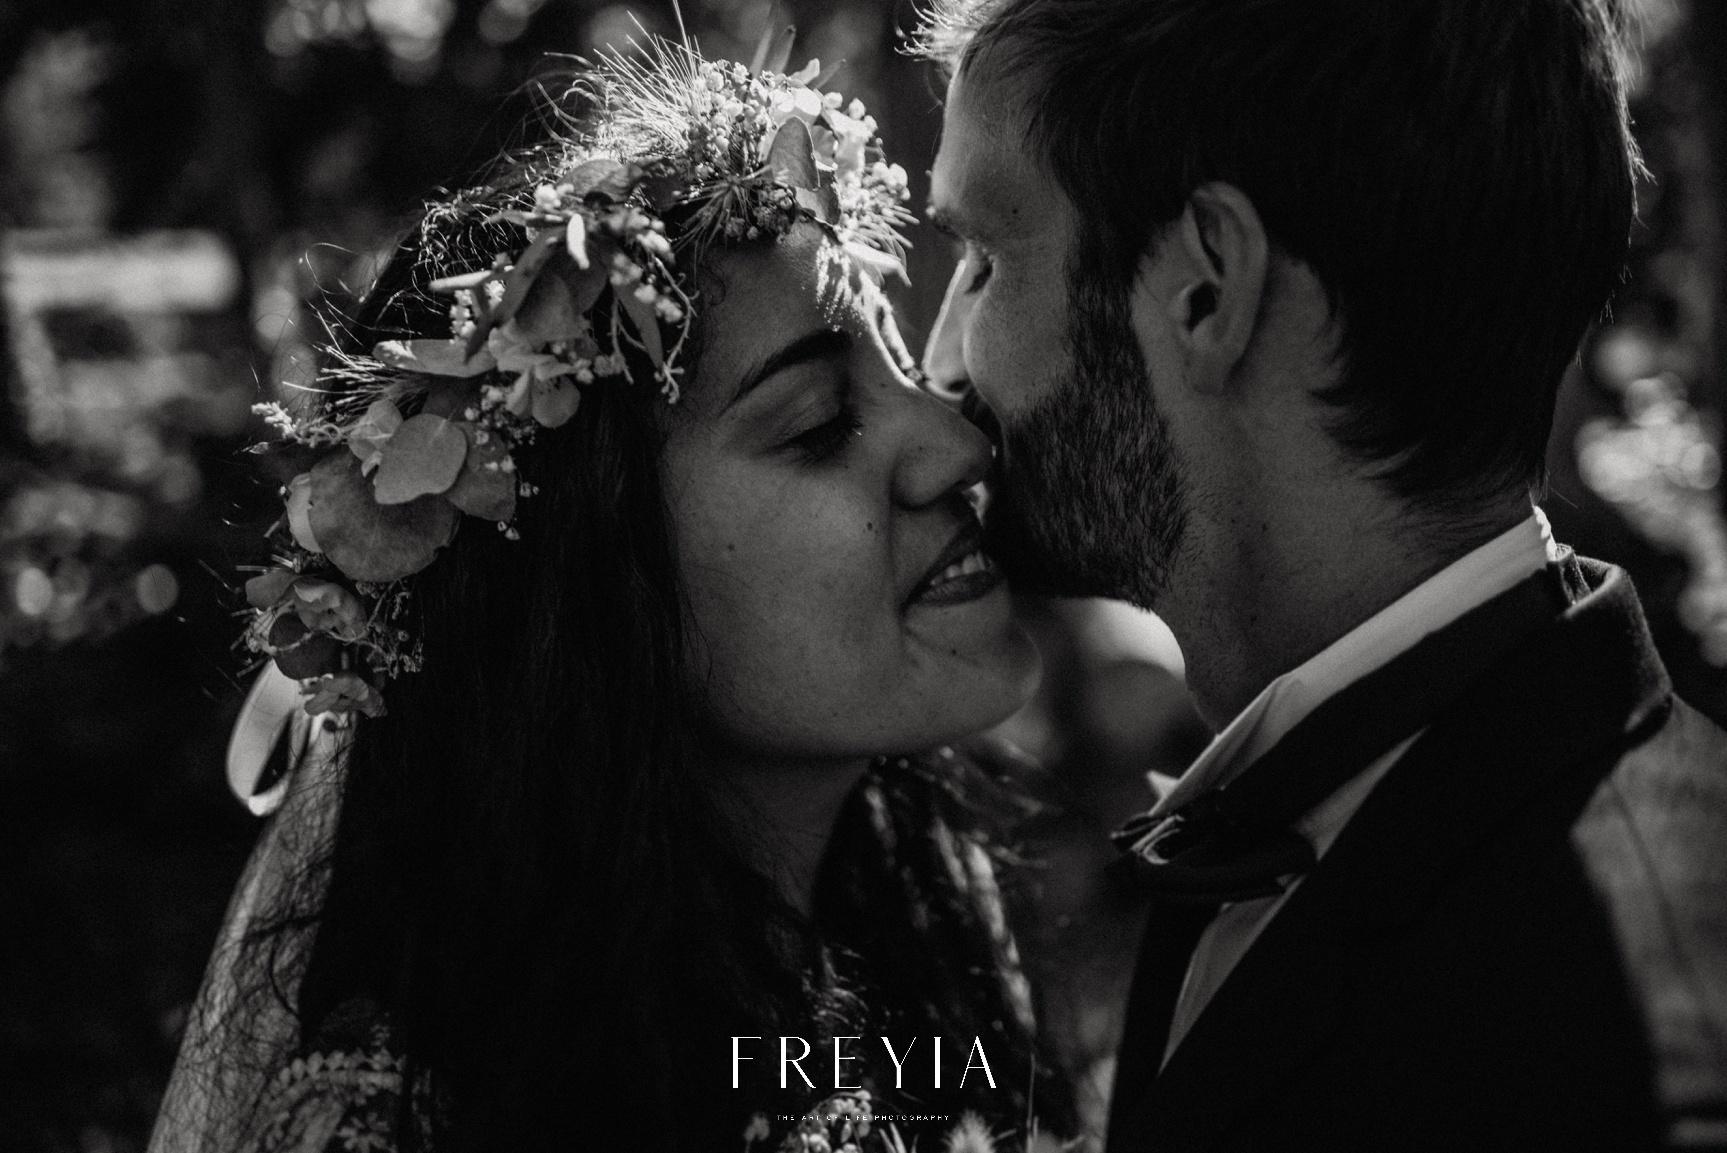 R + T |  mariage reportage alternatif moody intime minimaliste vintage naturel boho boheme |  PHOTOGRAPHE mariage PARIS france destination  | FREYIA photography_-224.jpg